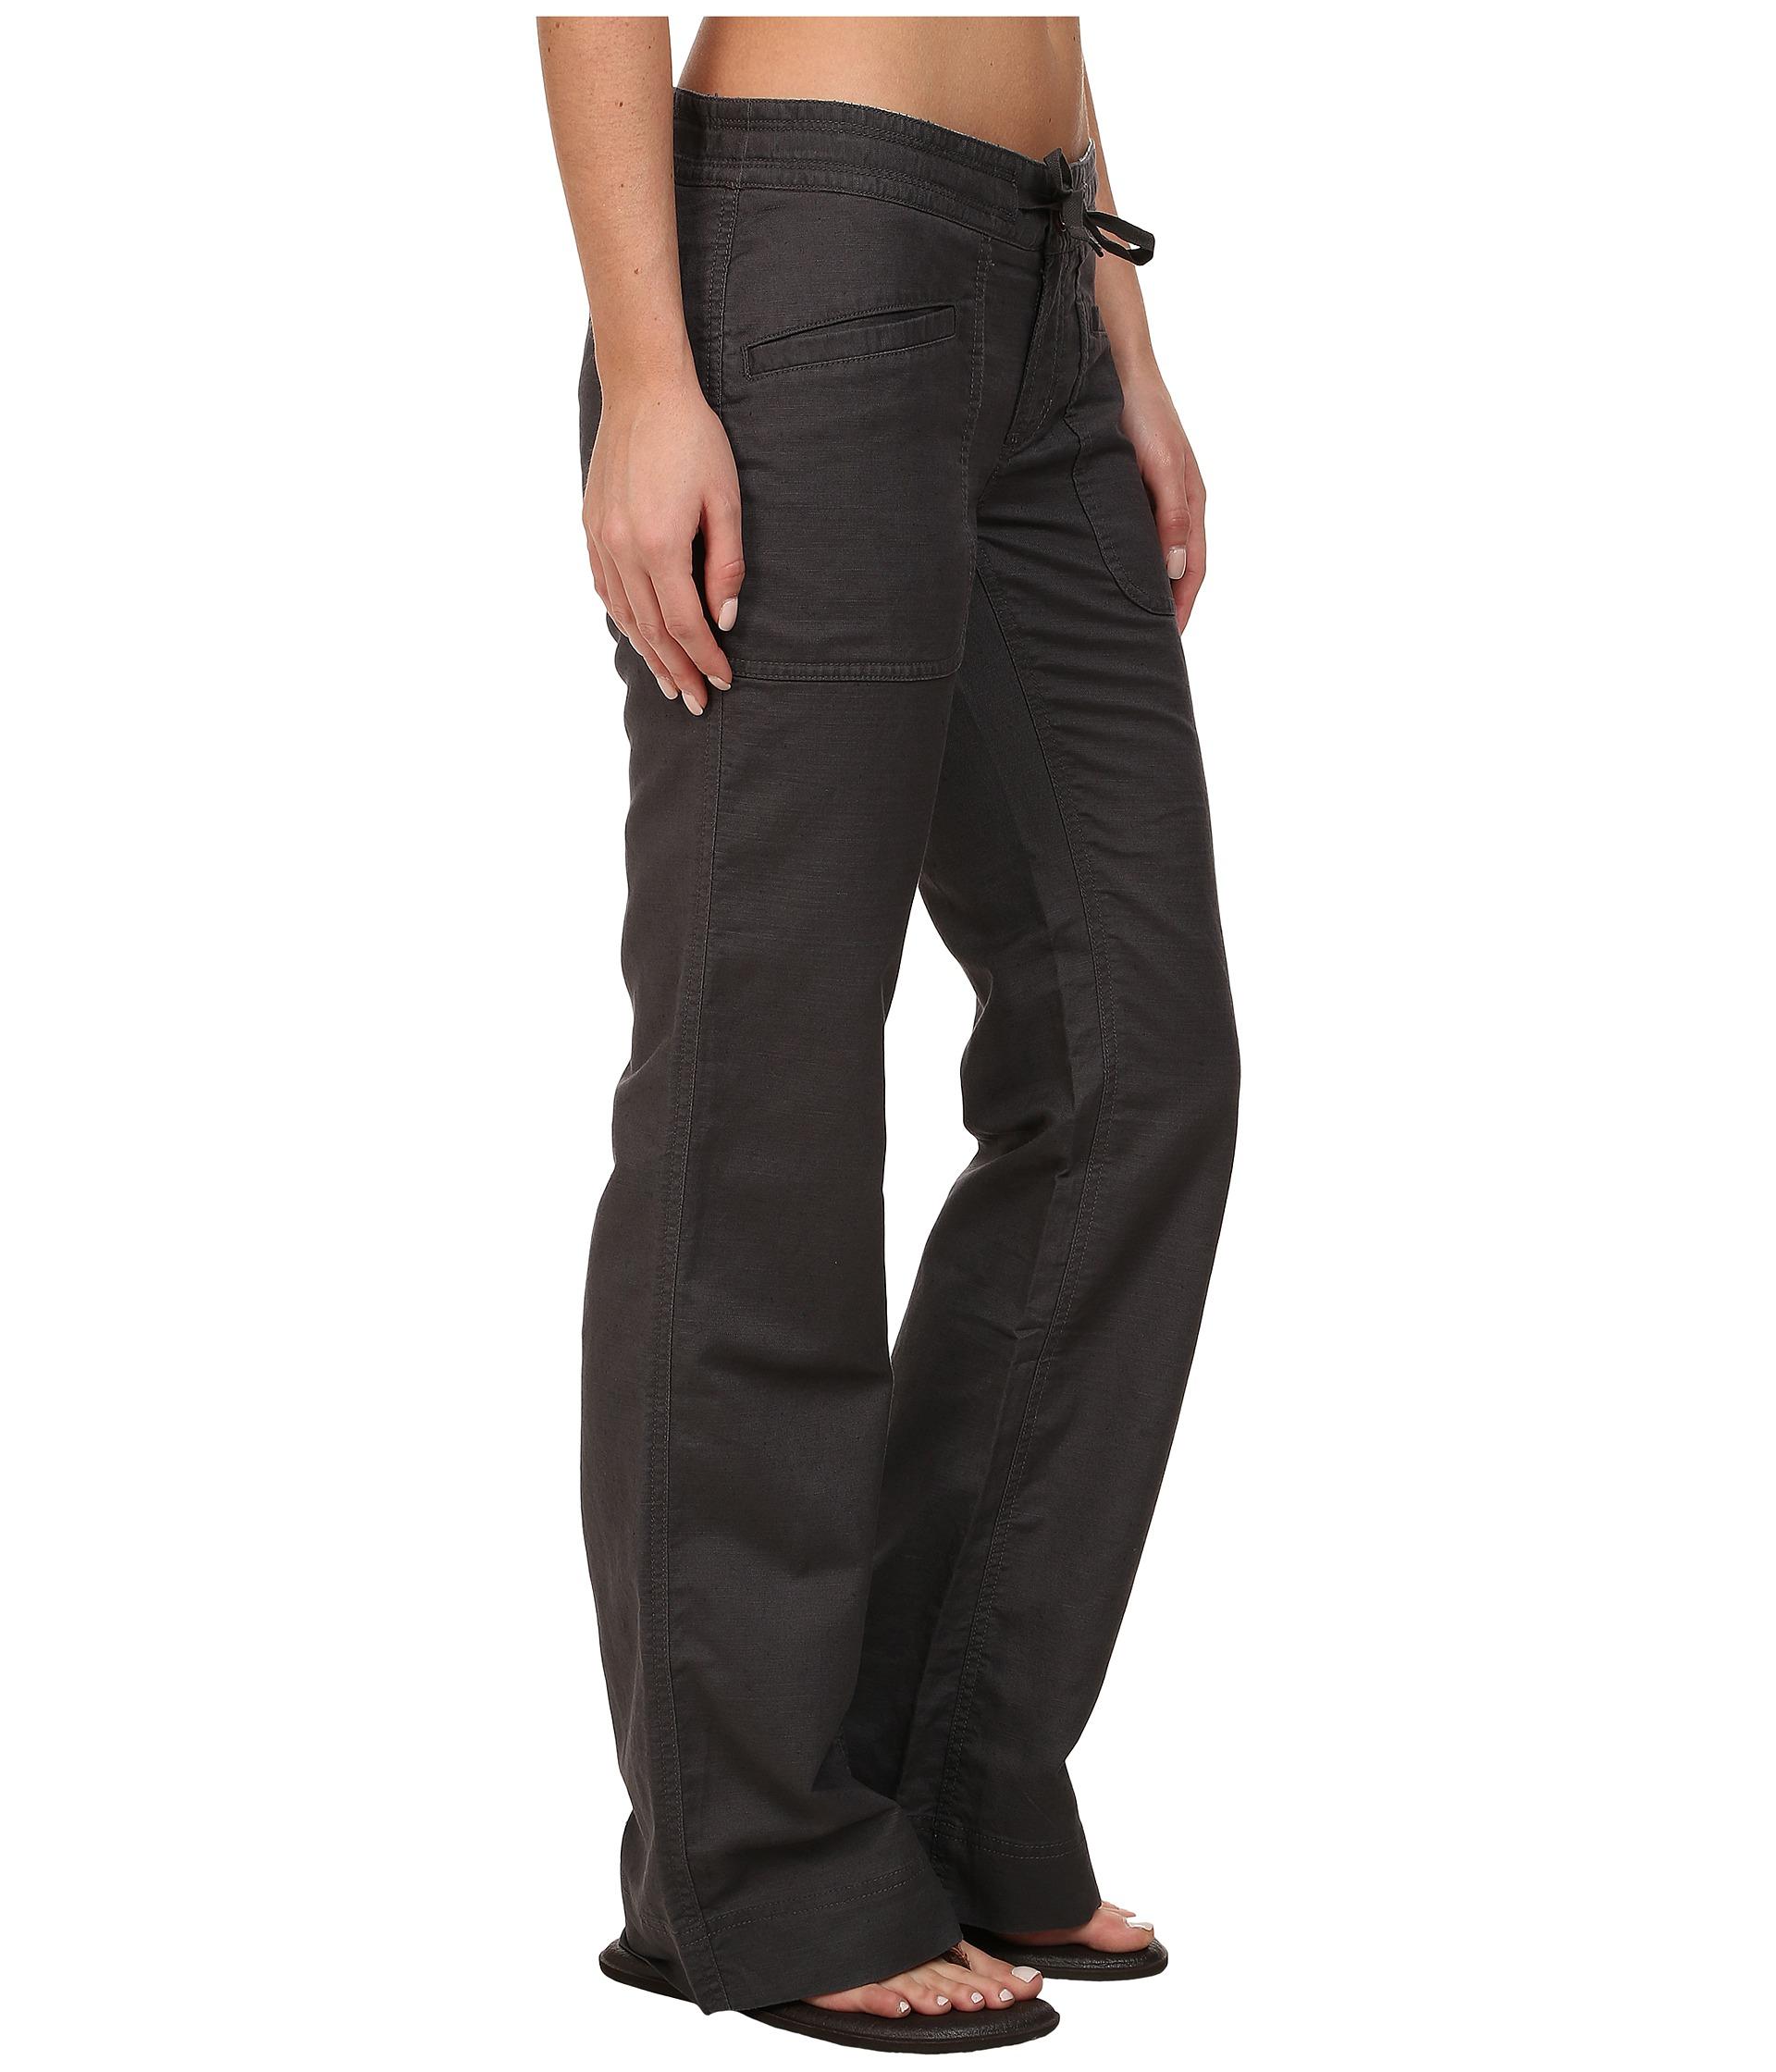 Original Grey Linen Pants Women  Fantastic Blue Grey Linen Pants Women Style U2013 Playzoa.com